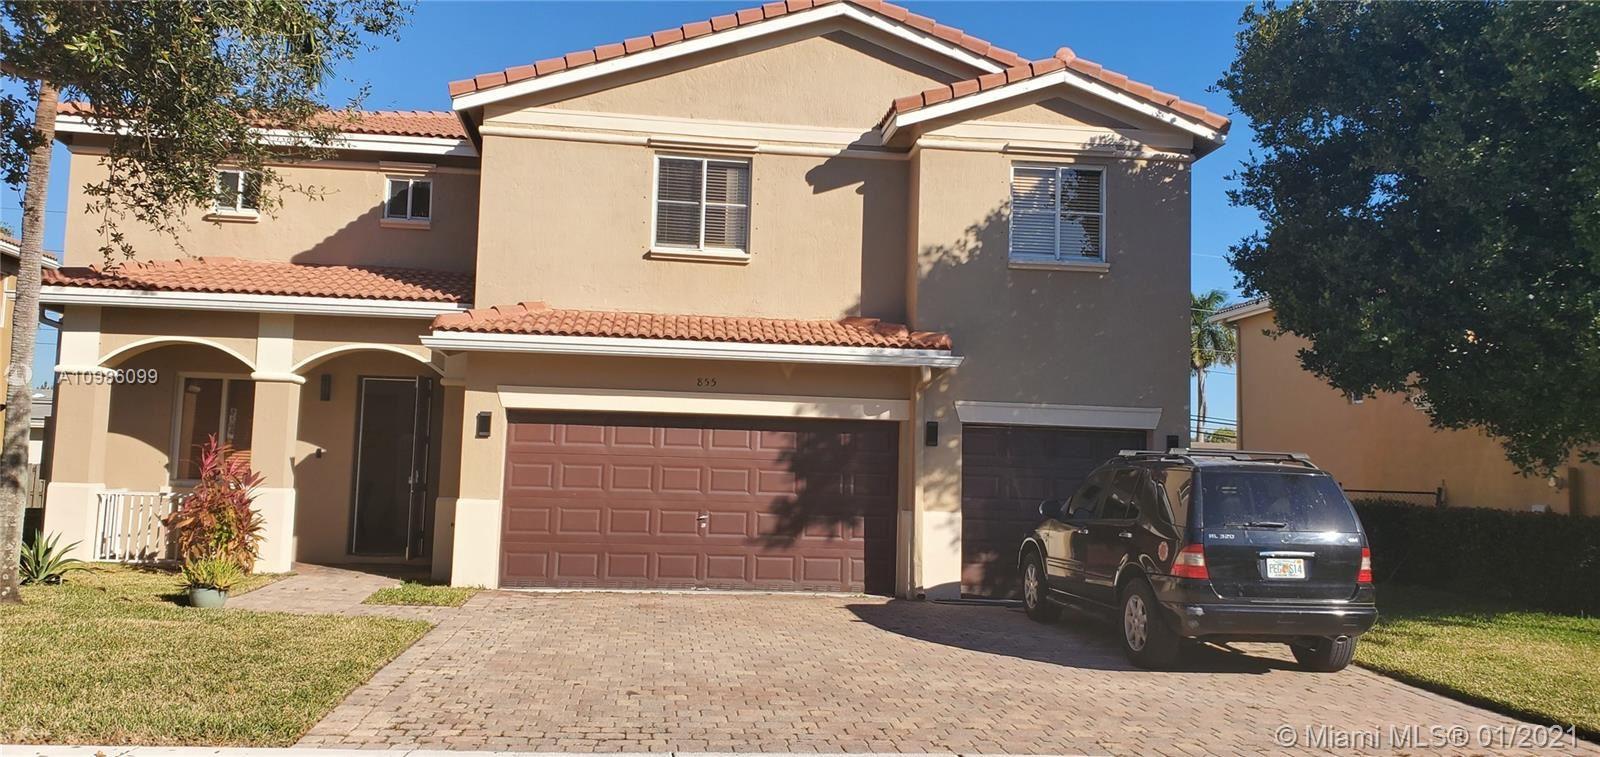 855 NW 206th Ter, Miami Gardens, FL 33169 - #: A10986099